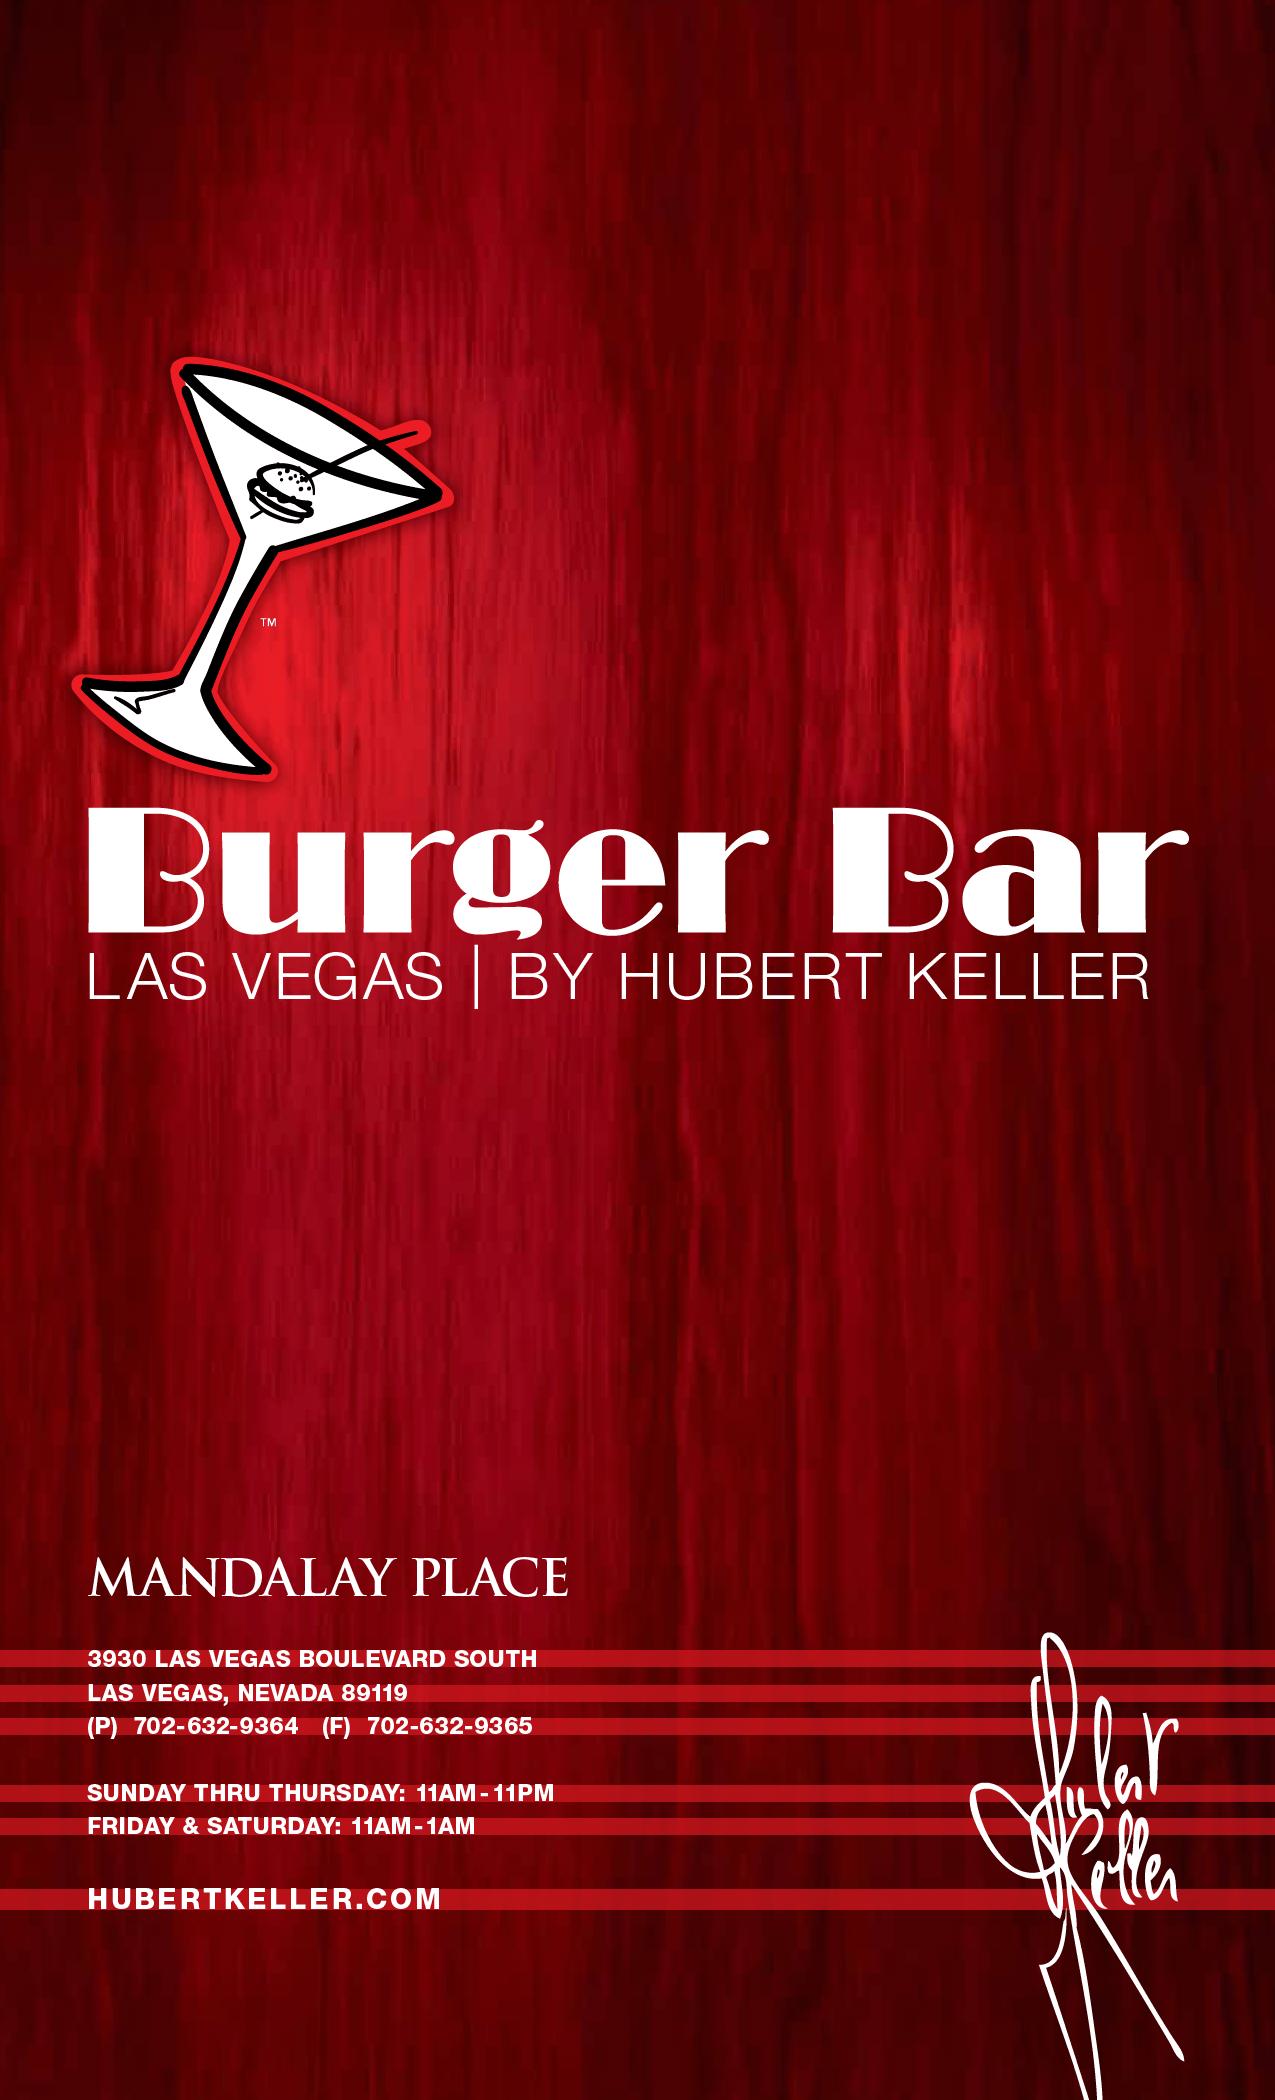 Mandalay Bay Two Bedroom Suite Menu Burger Barrestaurantmandalay Bay Vegas With A 5 Year Old